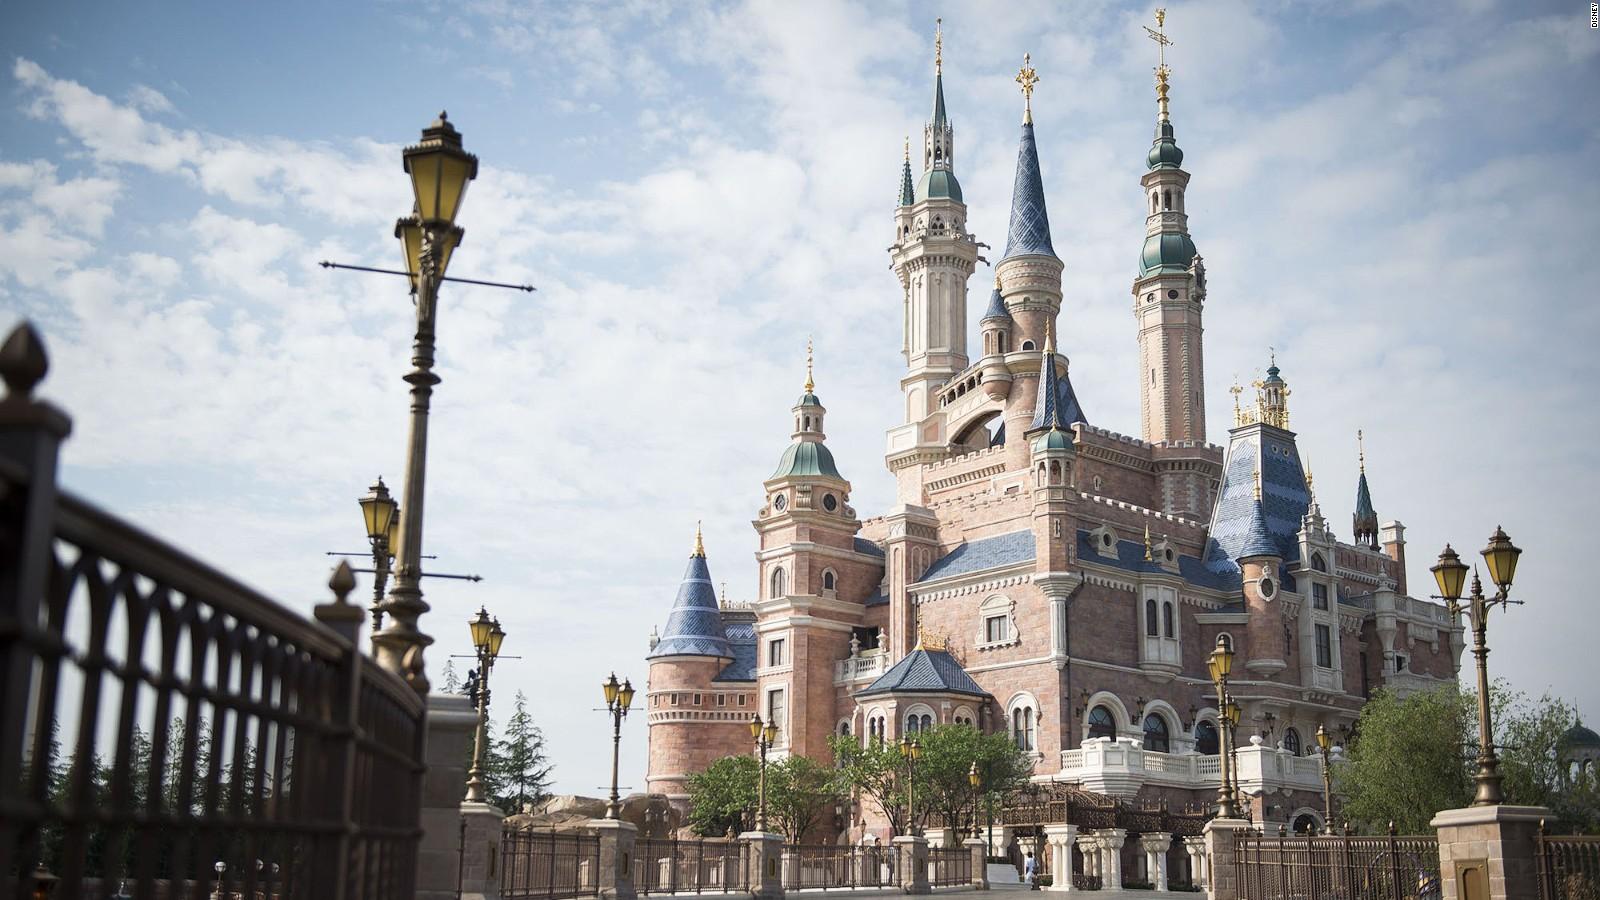 Shanghai Disney Resort: The brand\'s biggest international park | CNN ...